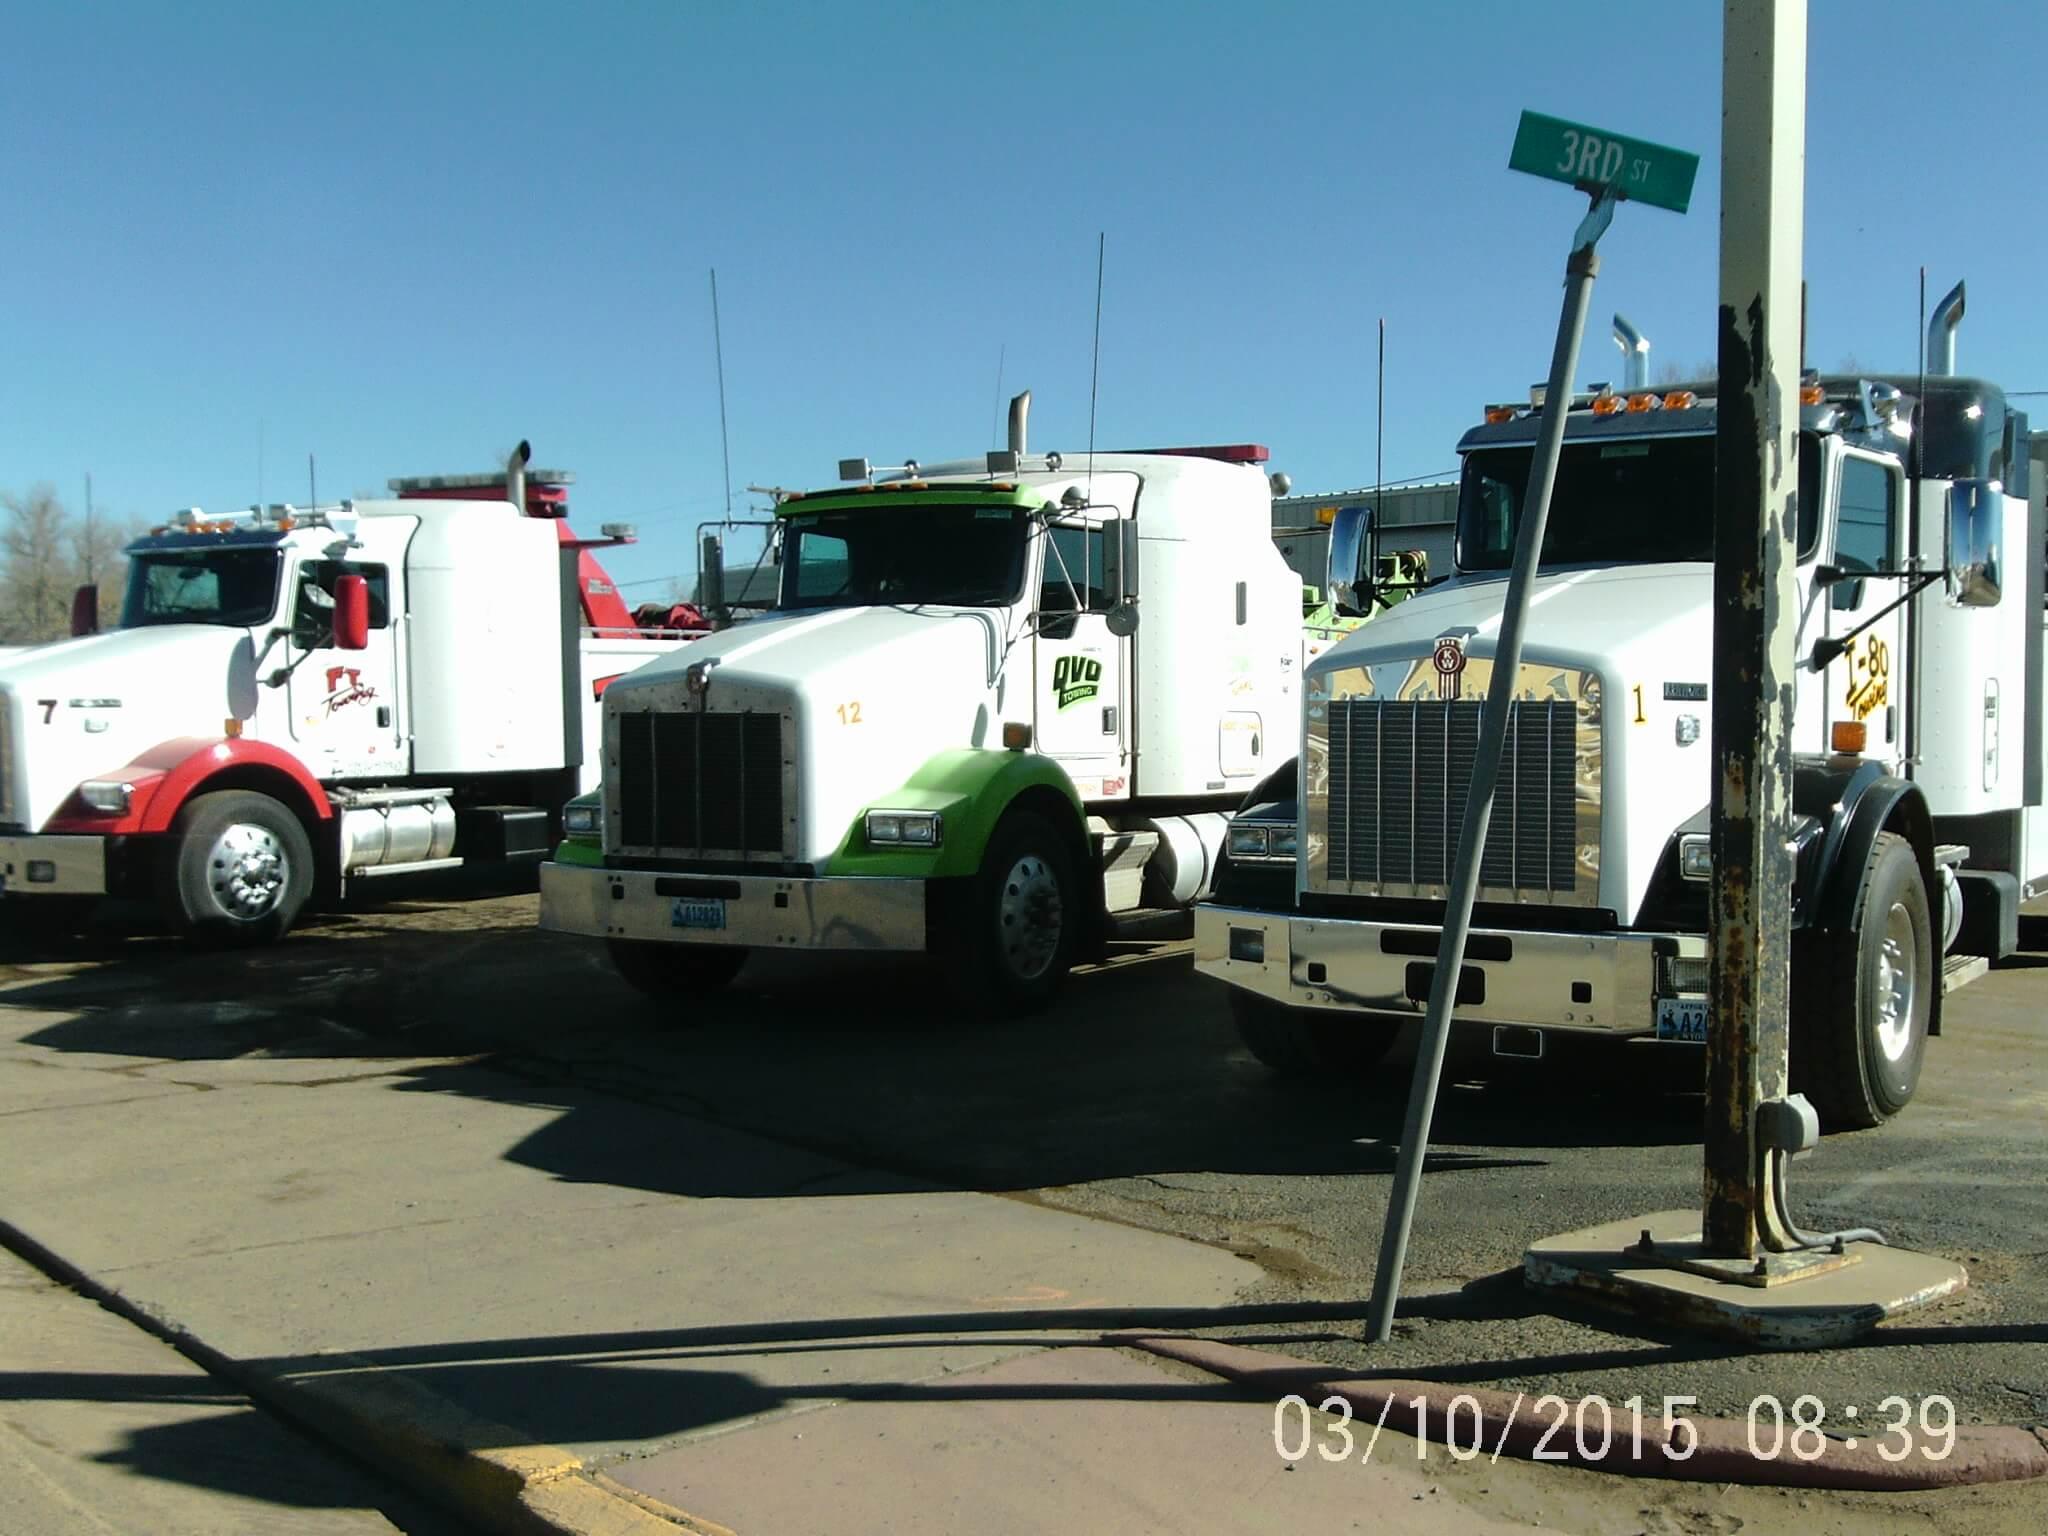 I-80 Towing Fleet